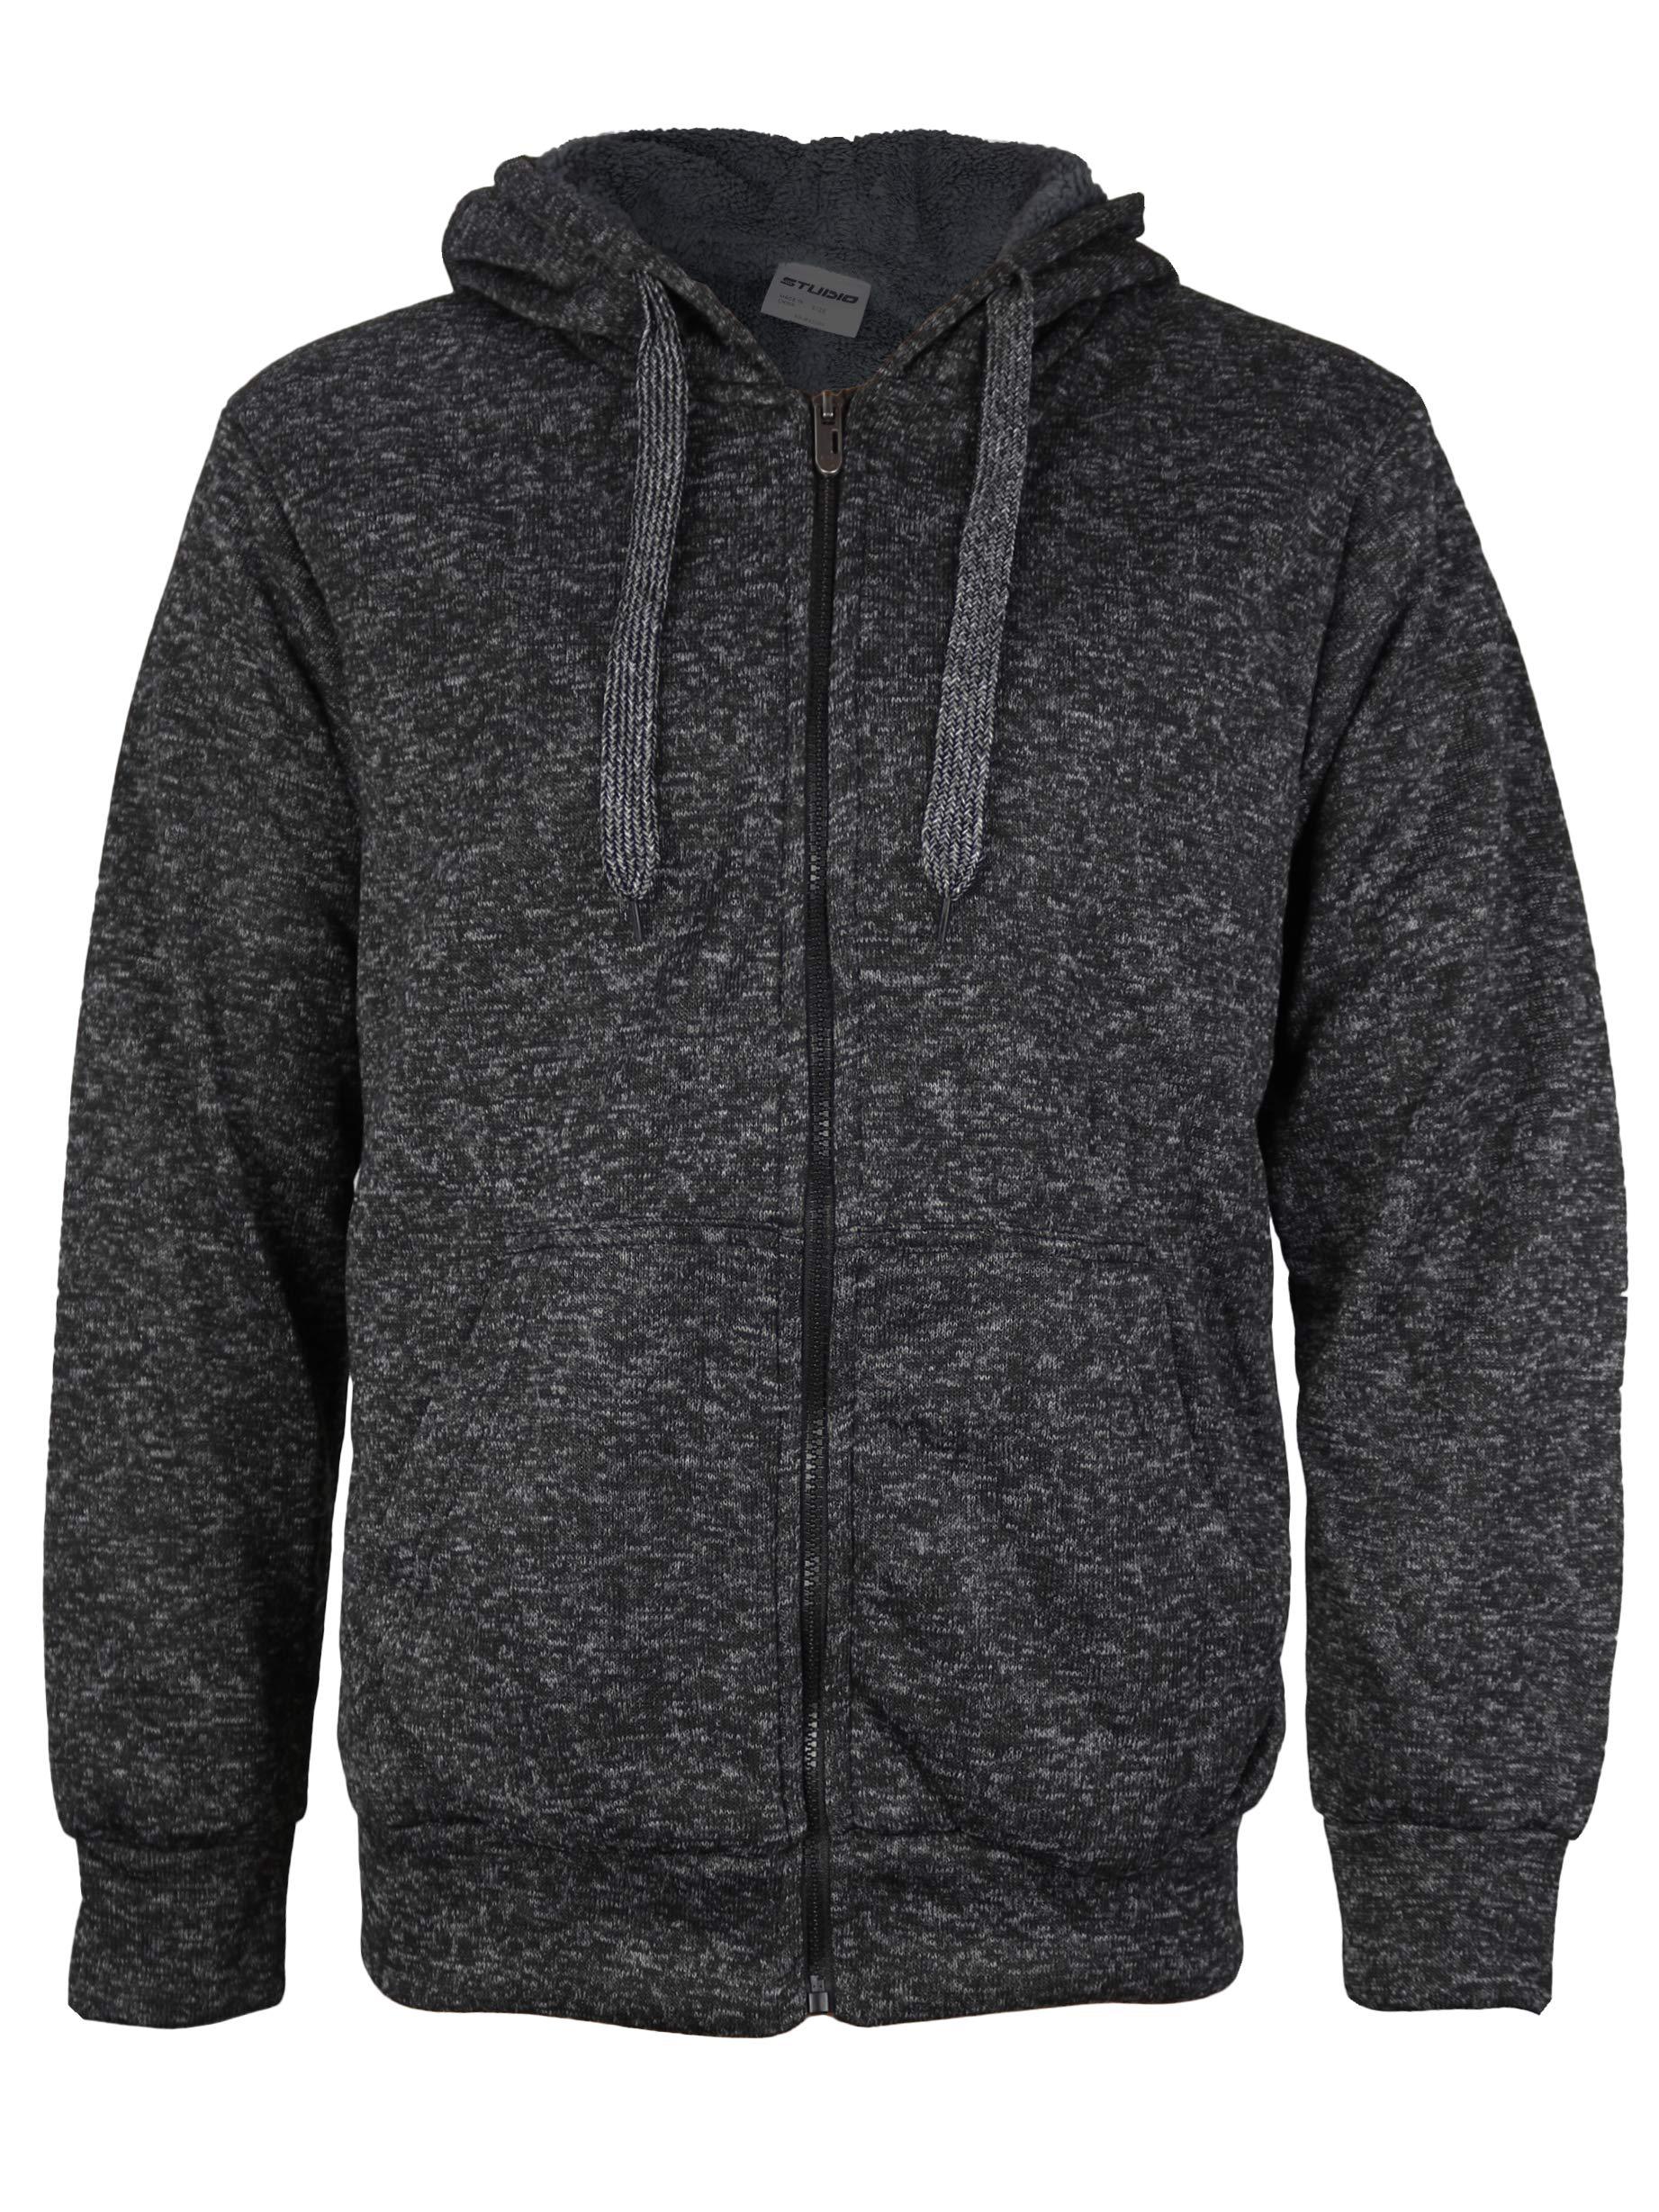 vkwear Men's Athletic Soft Sherpa Lined Fleece Zip Up Hoodie Sweater Jacket (Large, Salt & Pepper (Black))